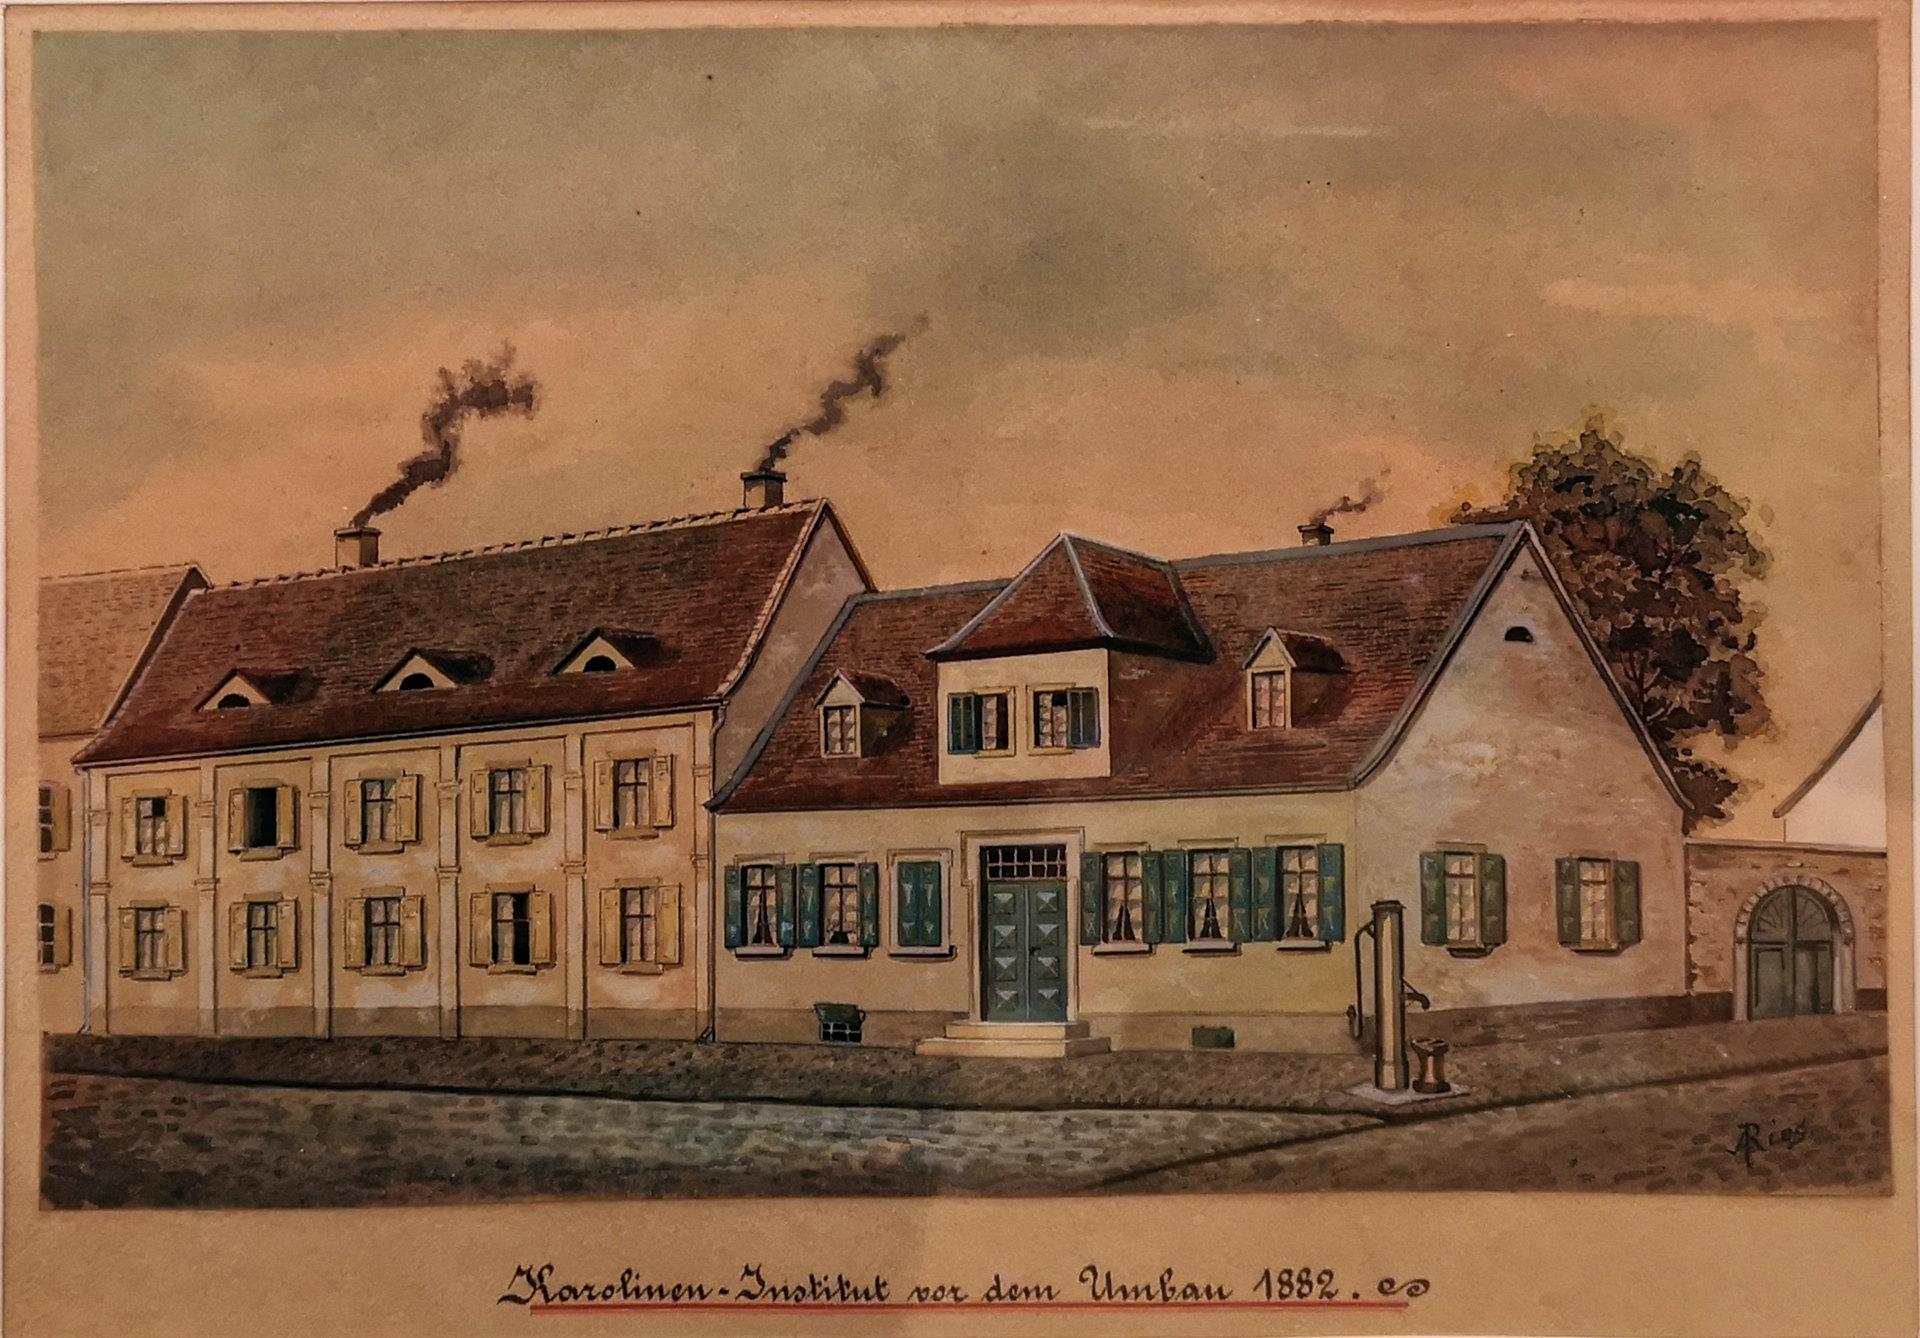 Karolinen-Institut vor dem Umbau 1882